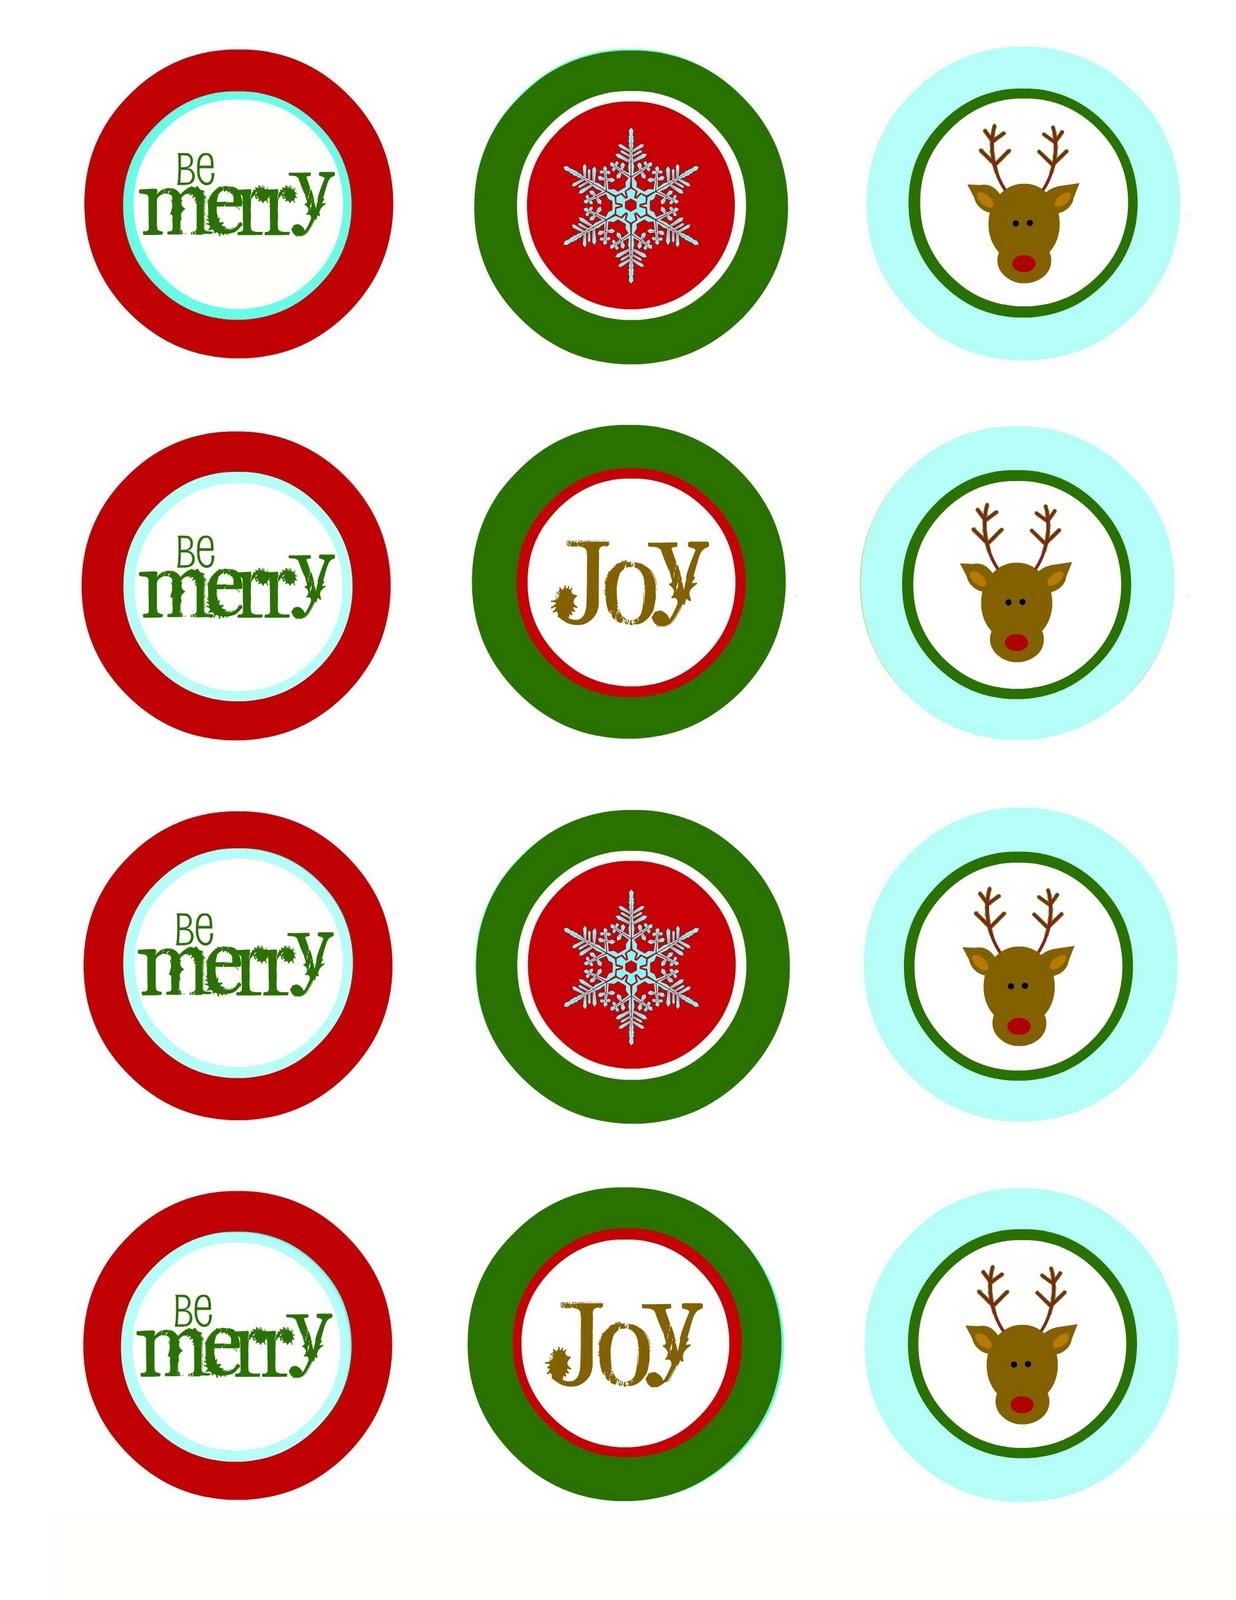 Christmas Cupcake Toppers.Oh Boy Oh Joy Free Winter Wonderland Christmas Cupcake